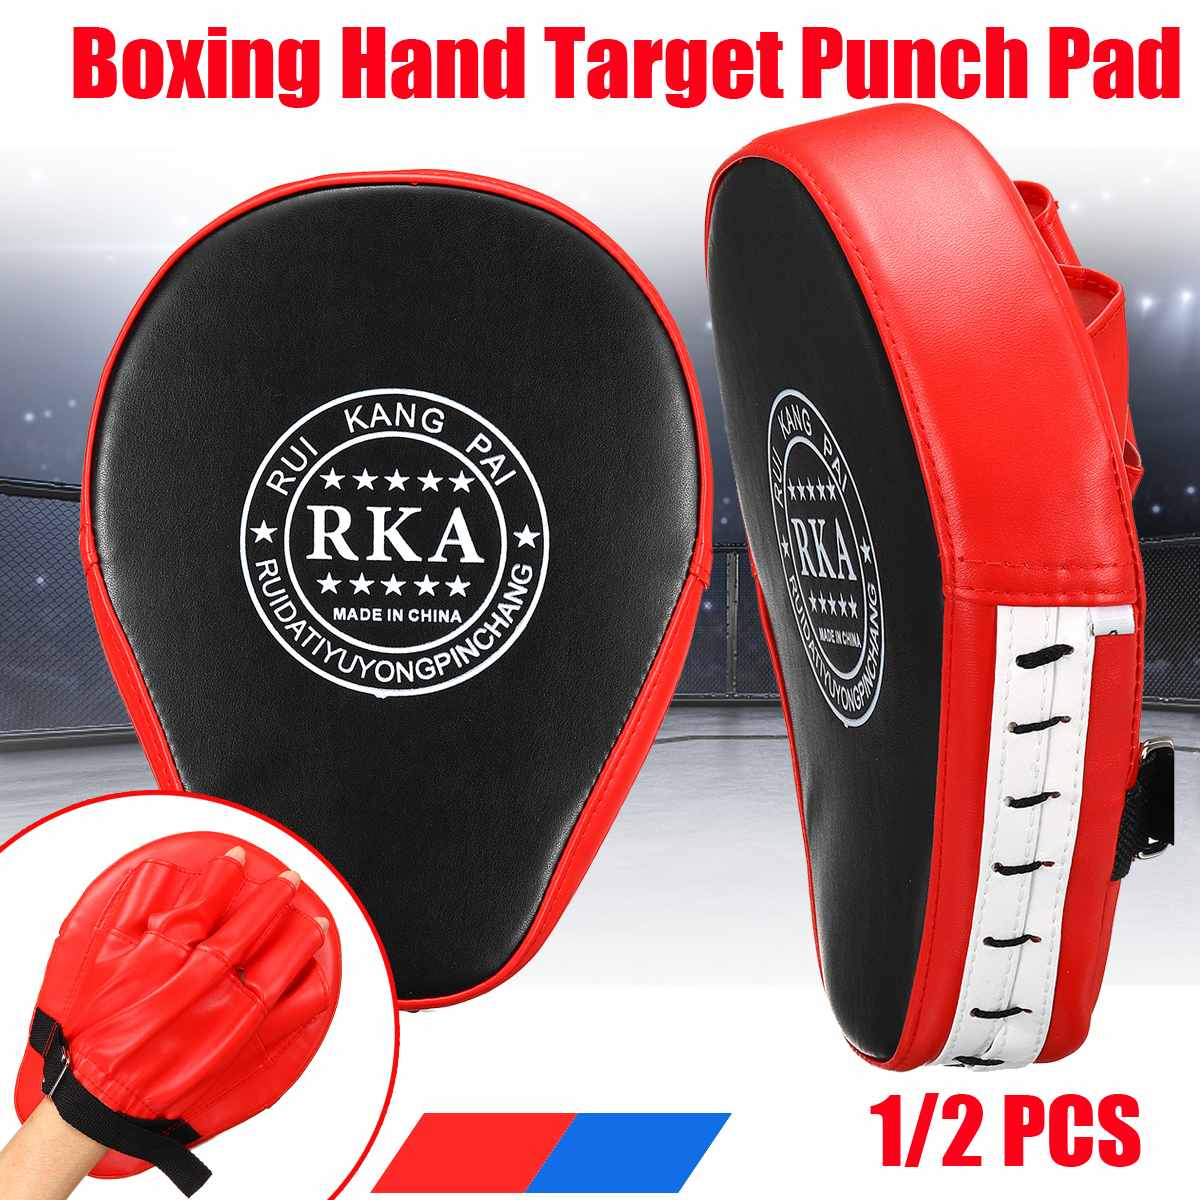 2PCS Punching Bag Boxing Pad Sand Bag Fitness Taekwondo MMA Hand Kicking Pad PU Leather Training Gea